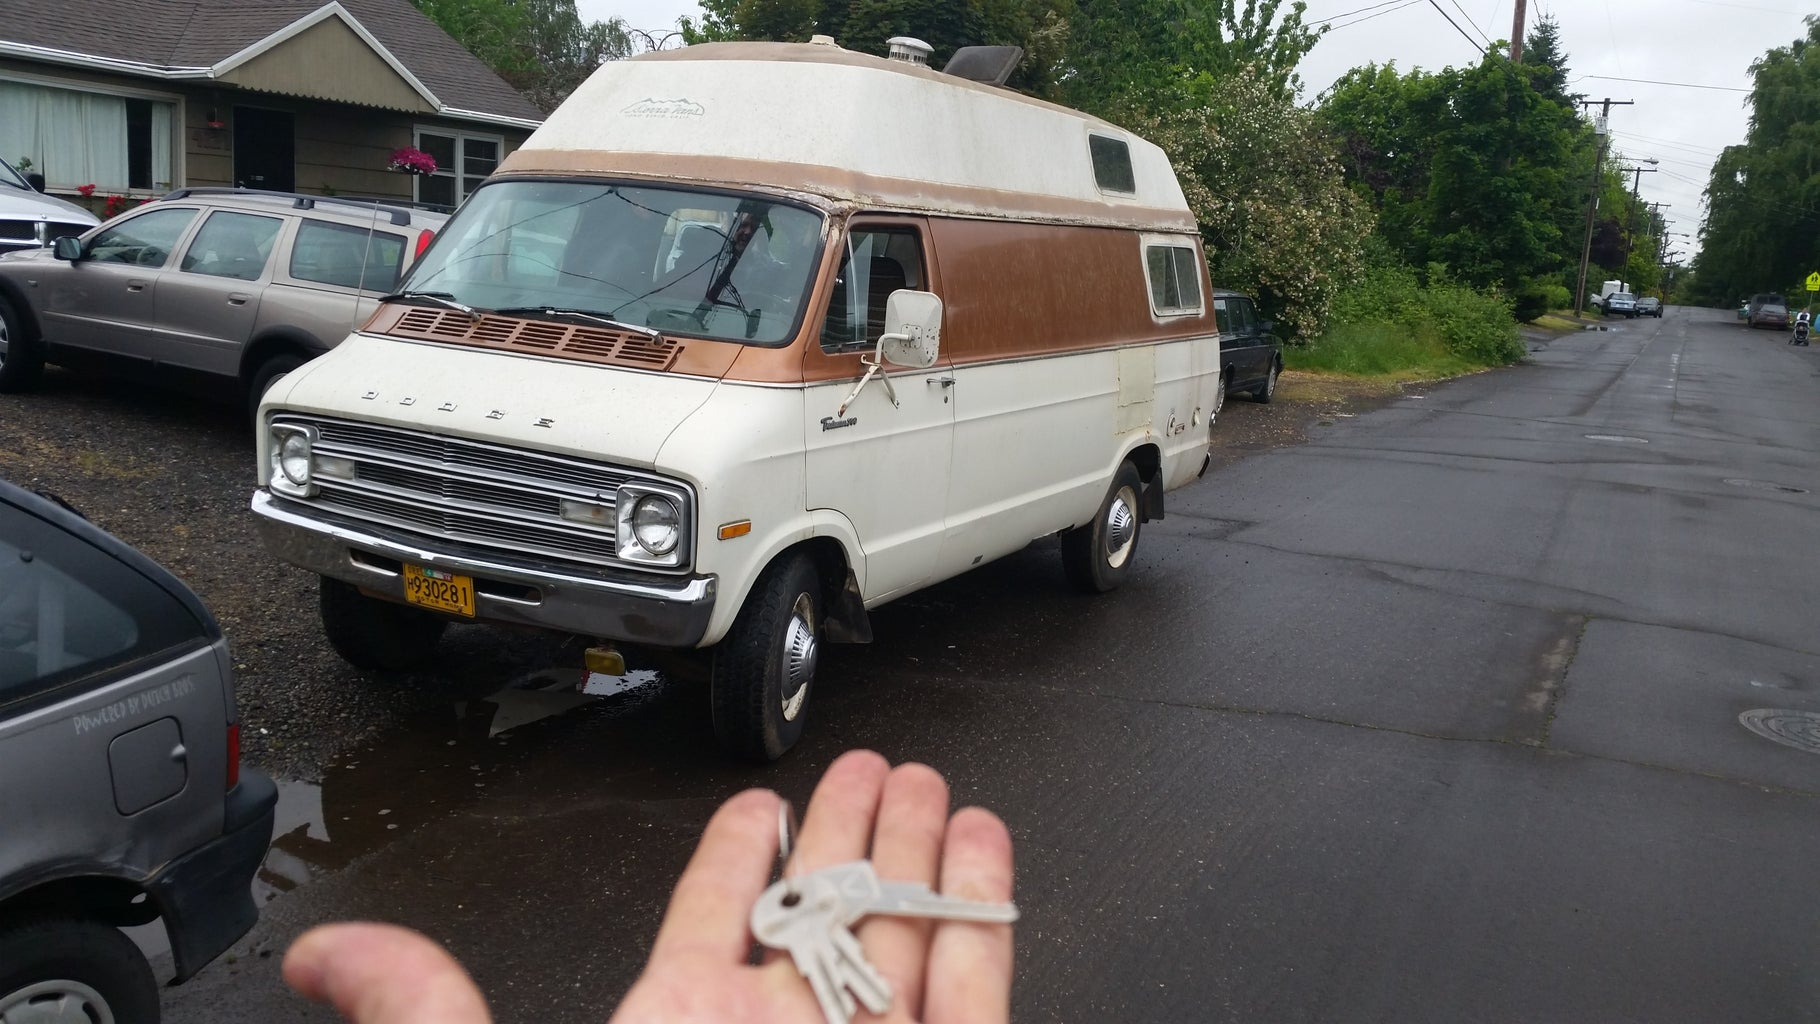 Selecting the Van